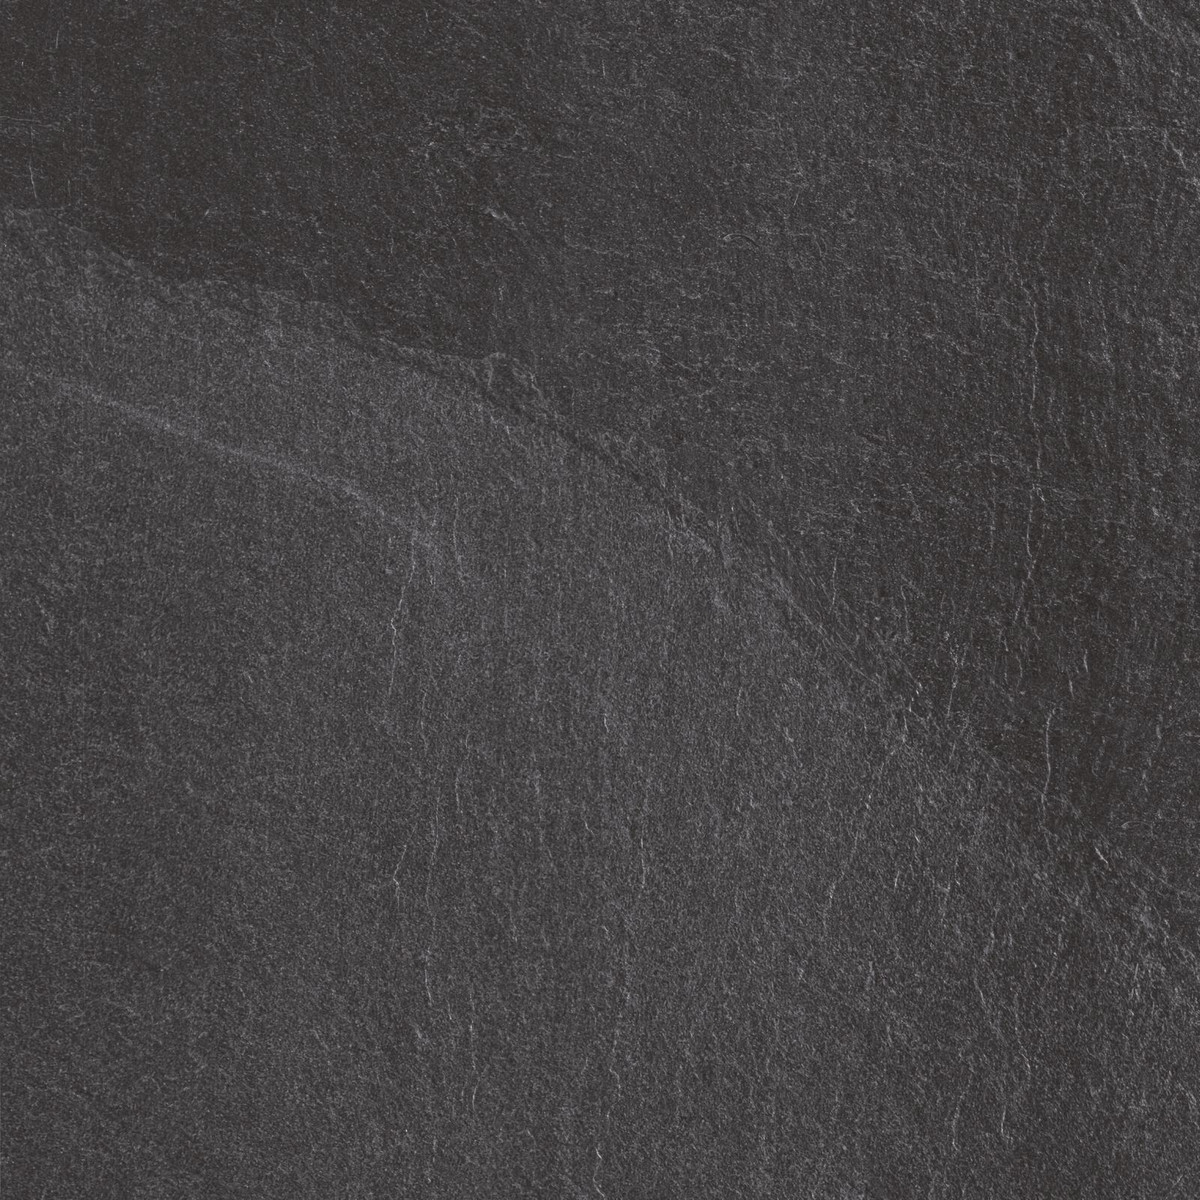 Bodenfliese Gazzini Slide black 60 x 60 cm – Bild 2